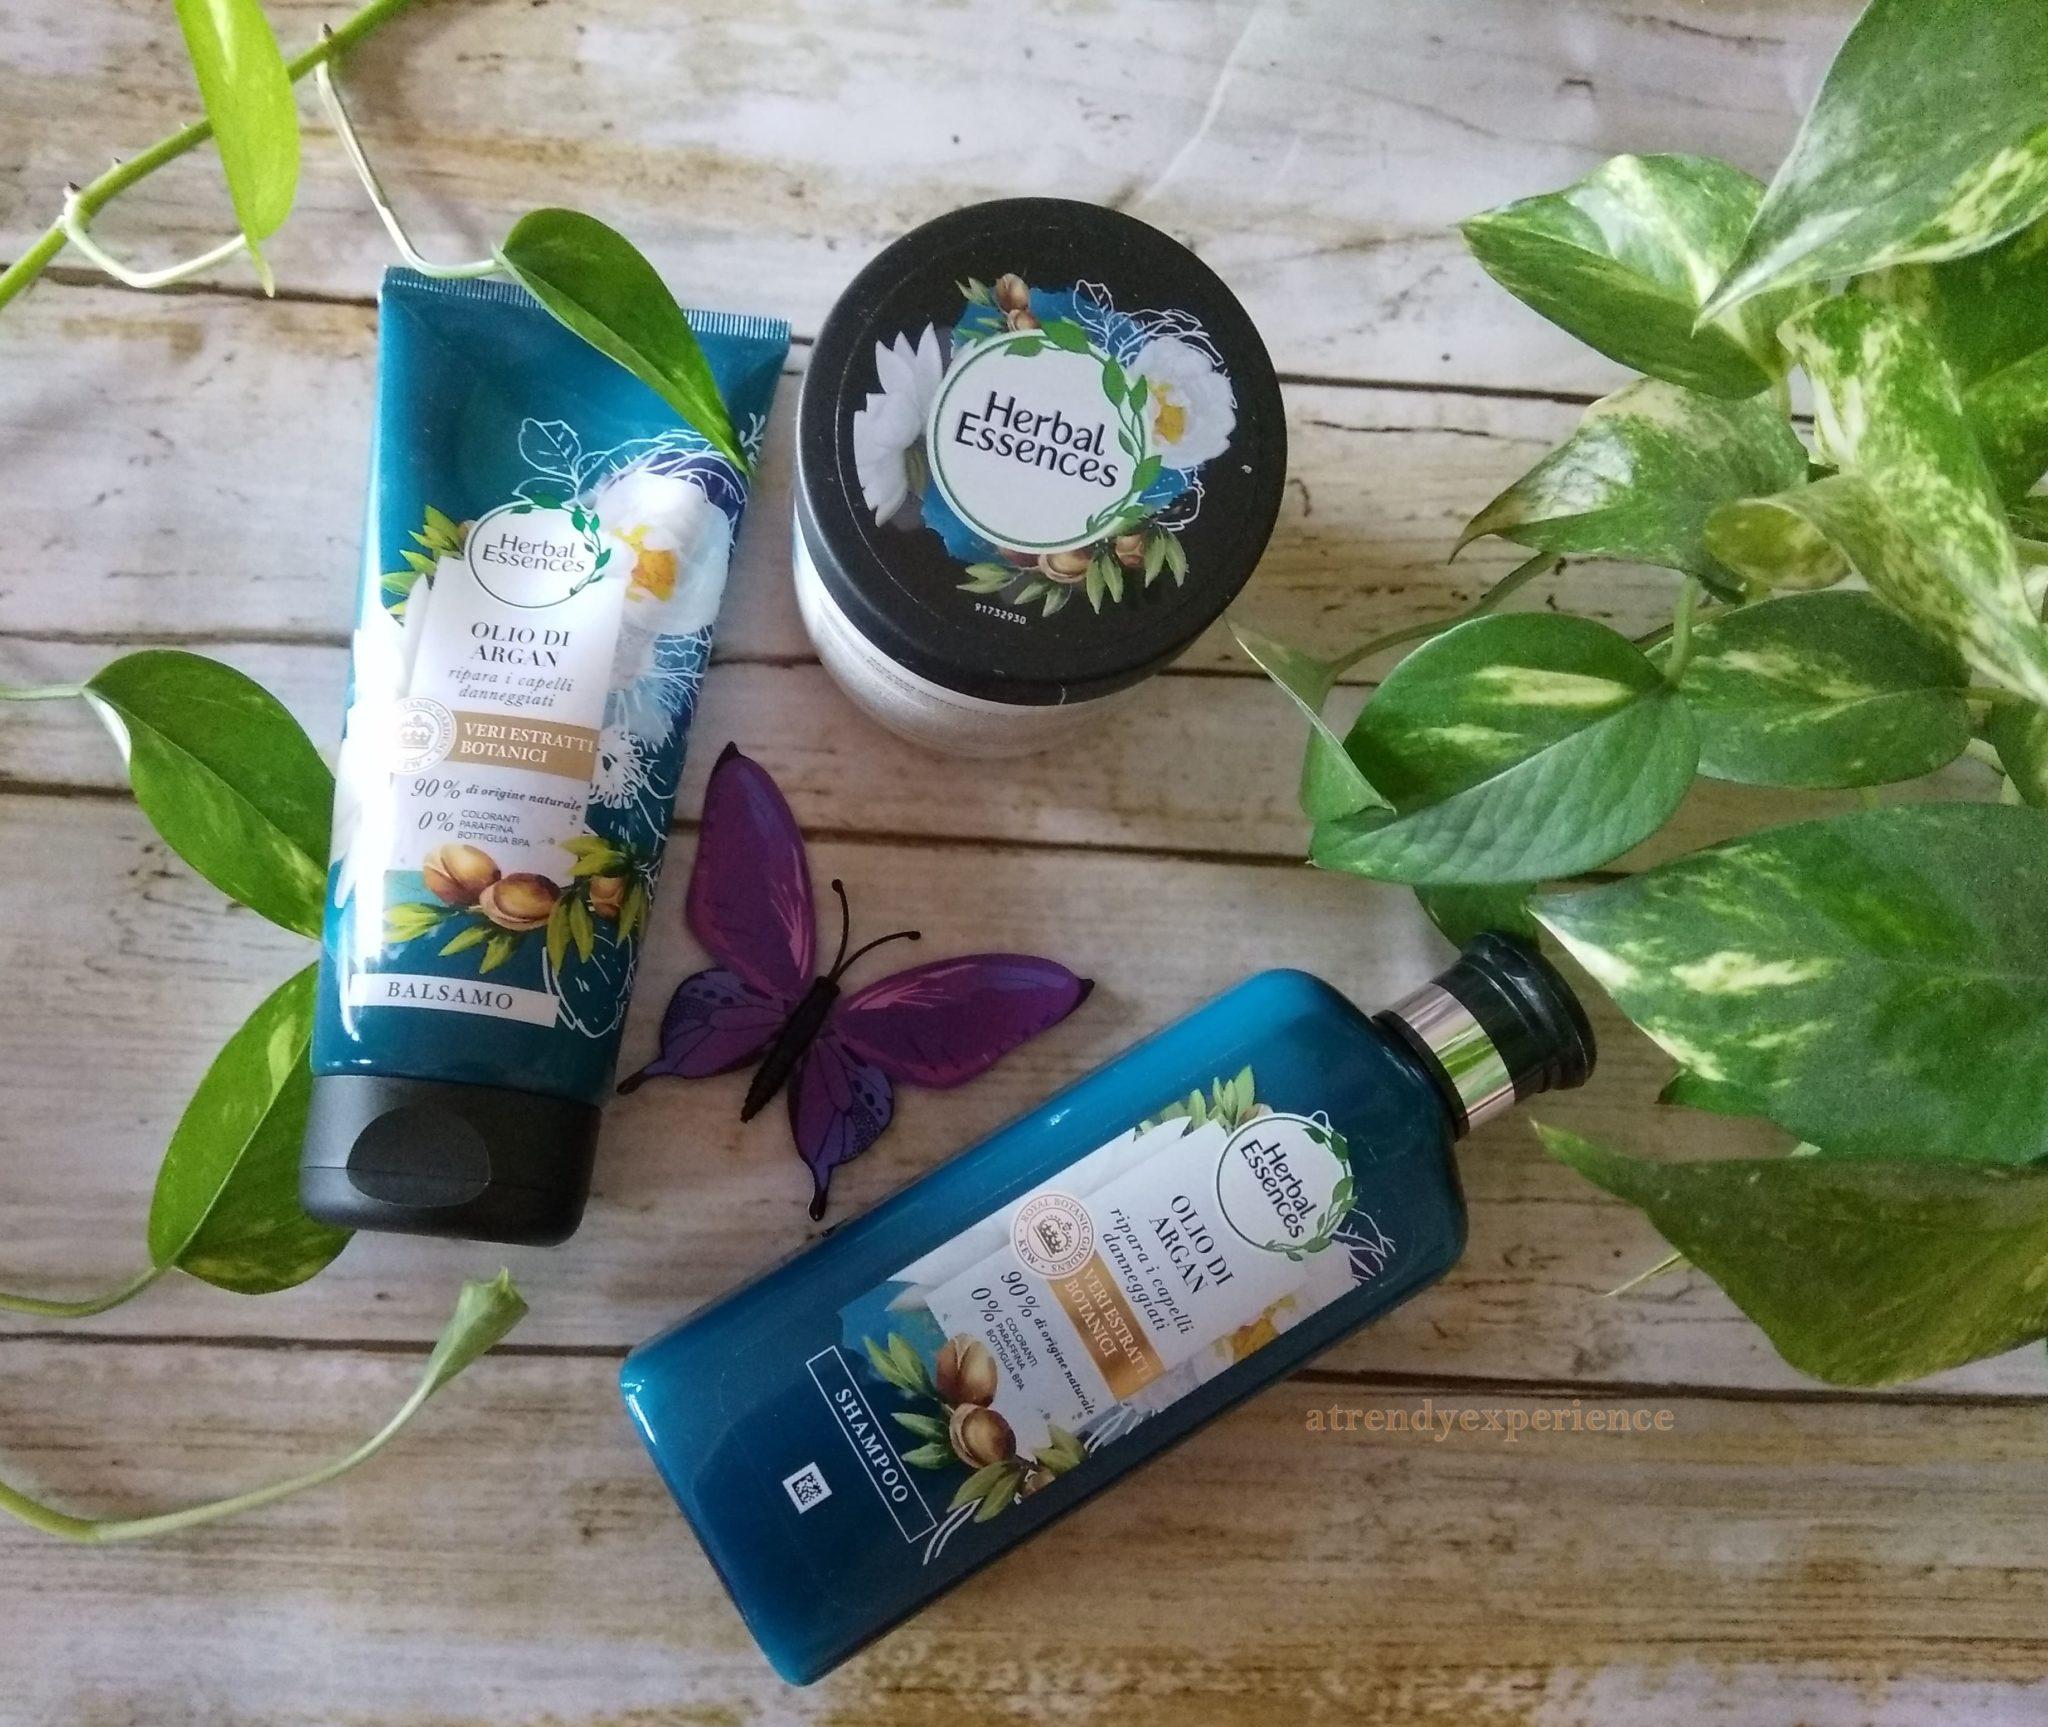 nuova linea olio di argan herbal essences